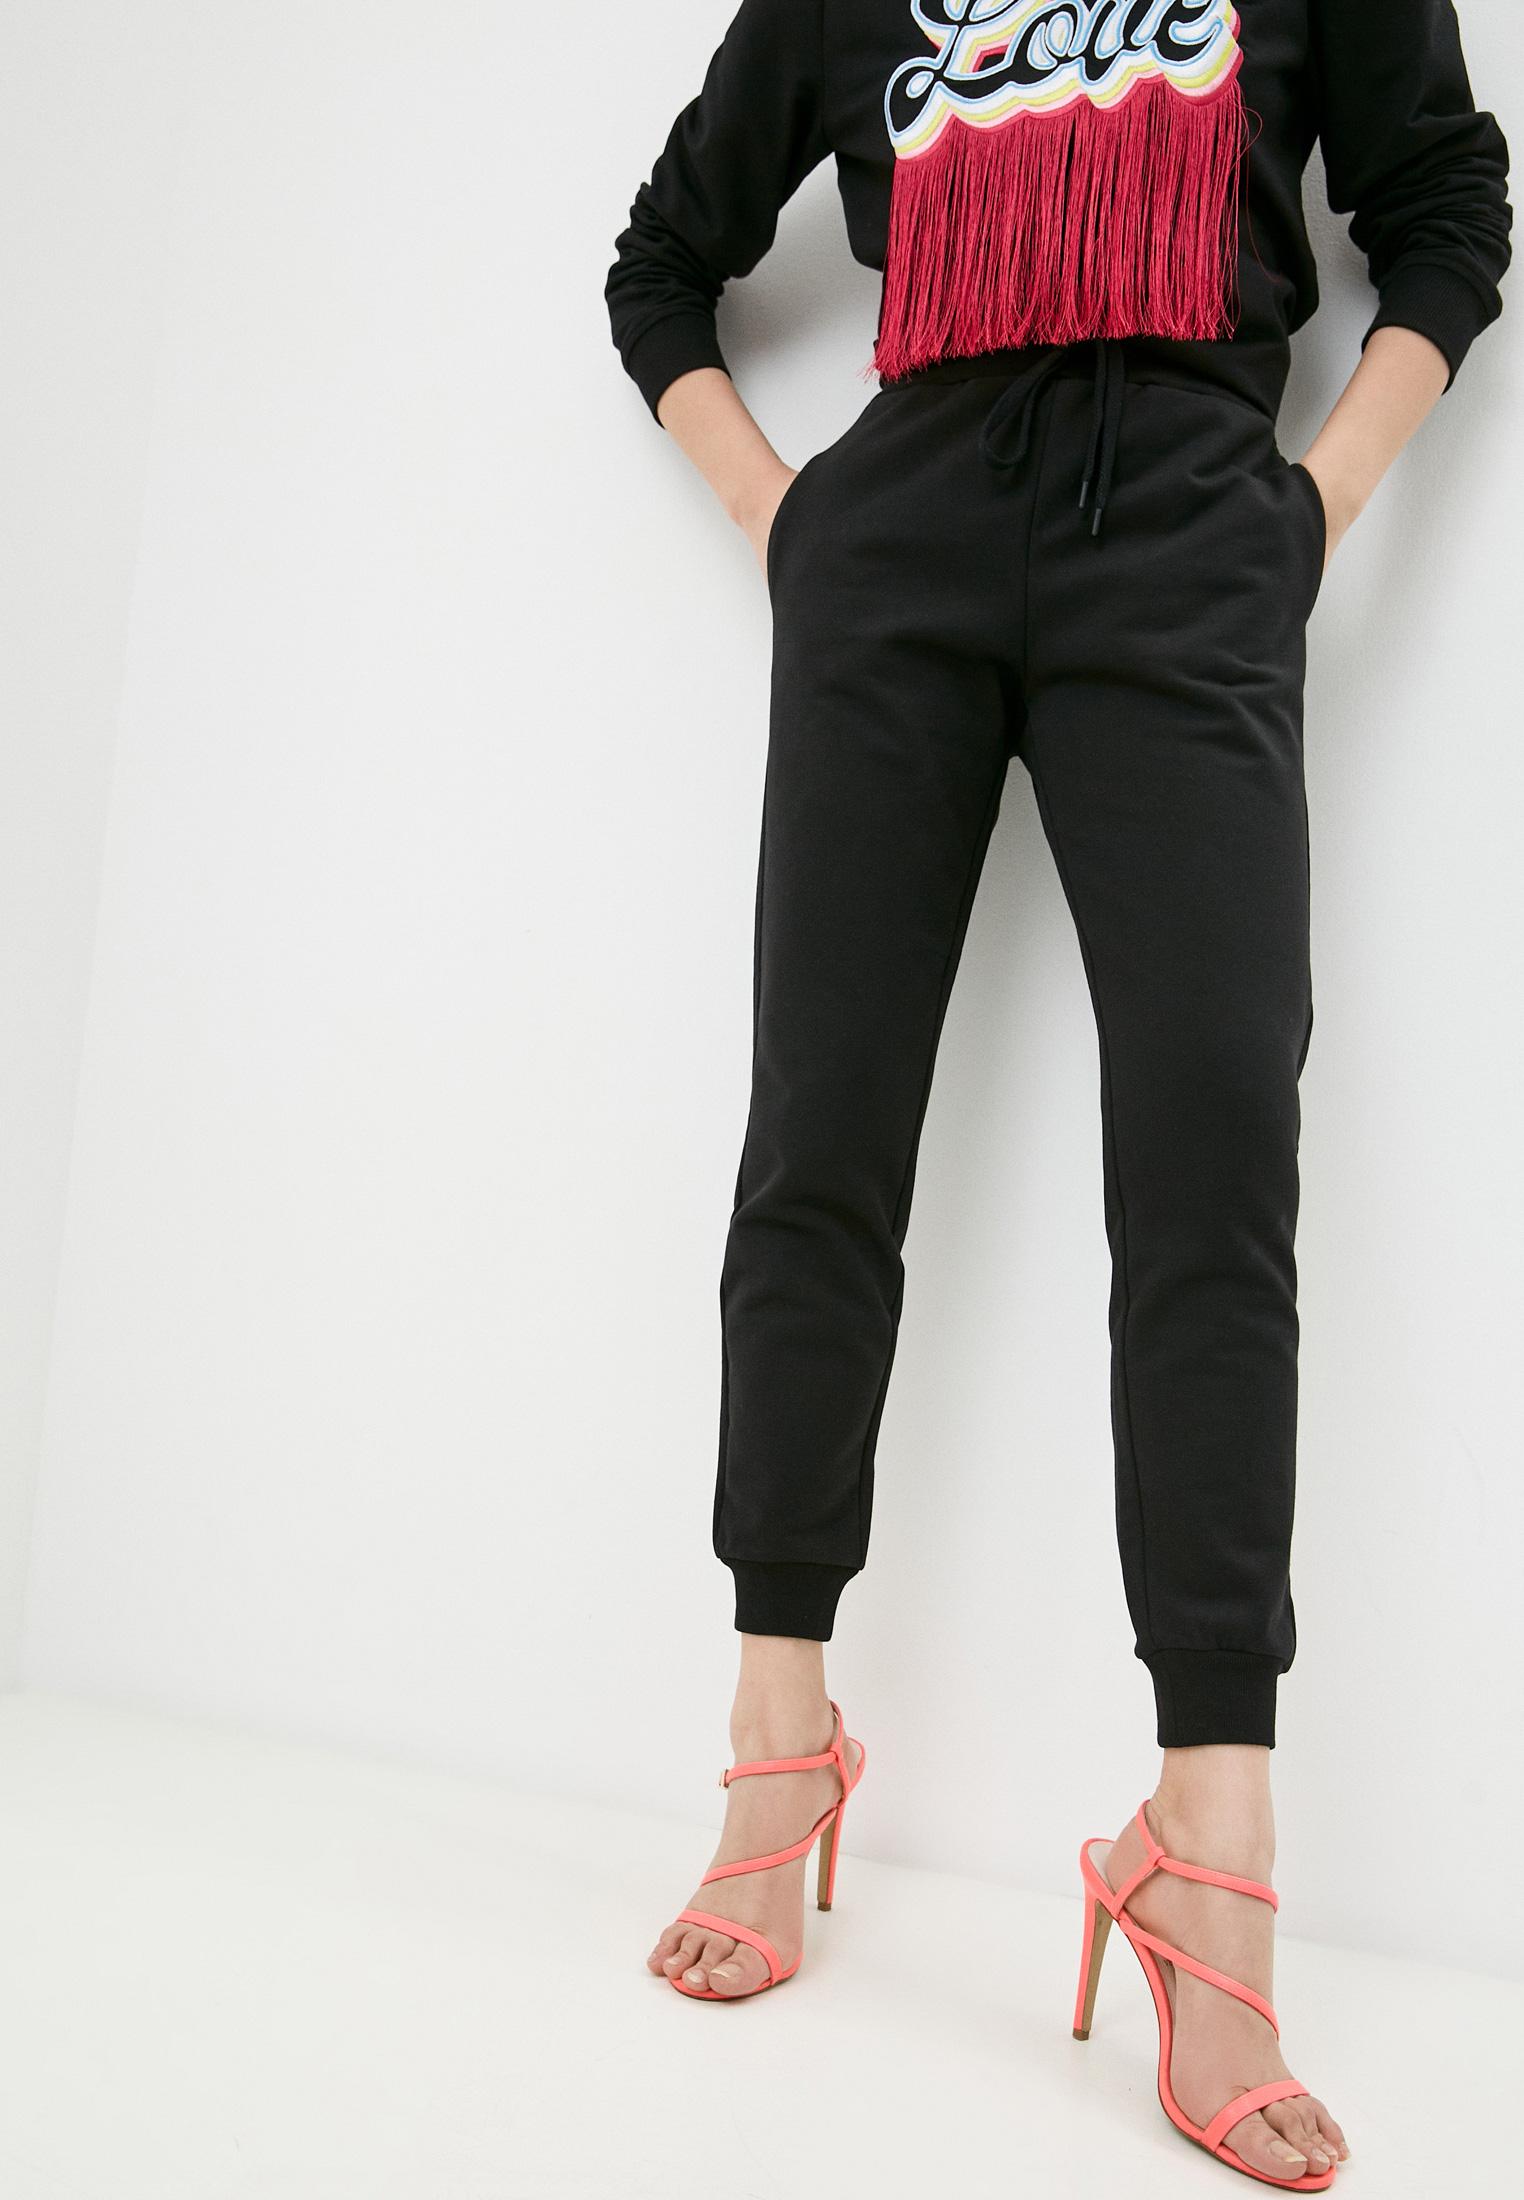 Женские спортивные брюки Love Moschino W 1 519 02 M 4266